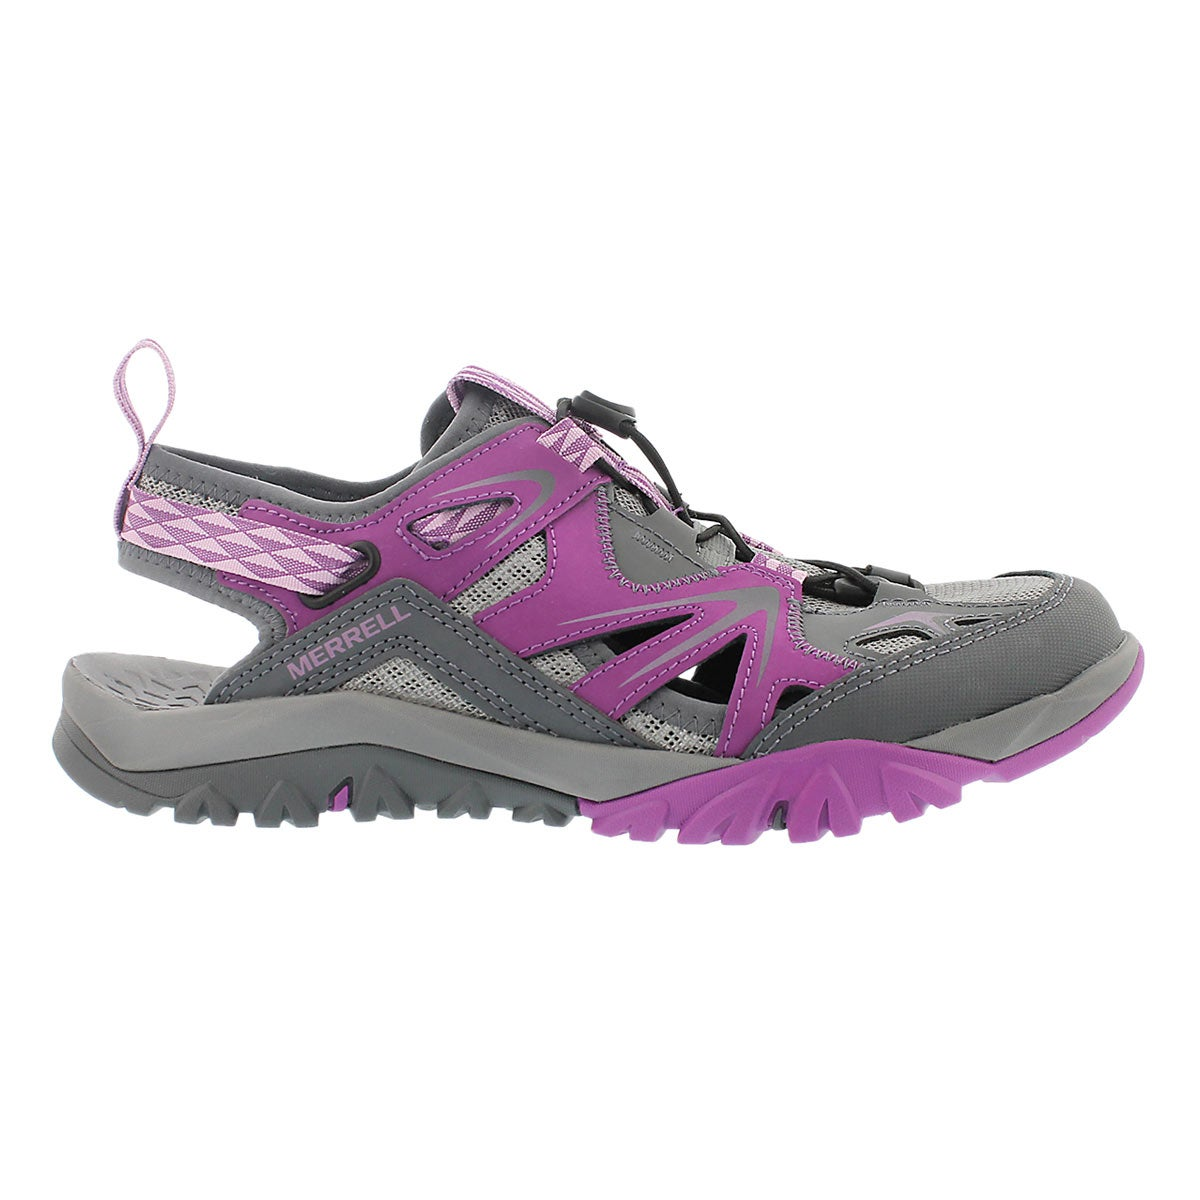 Lds Capra Rapid ppl/grey sieve sandal